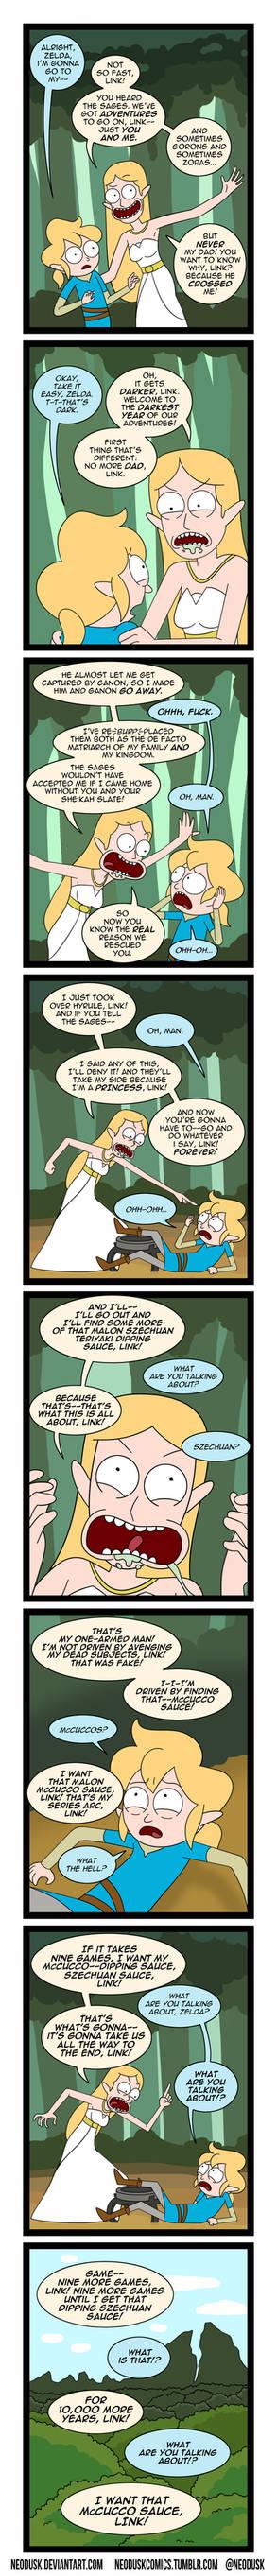 Link and Zelda Season 3 Episode 1